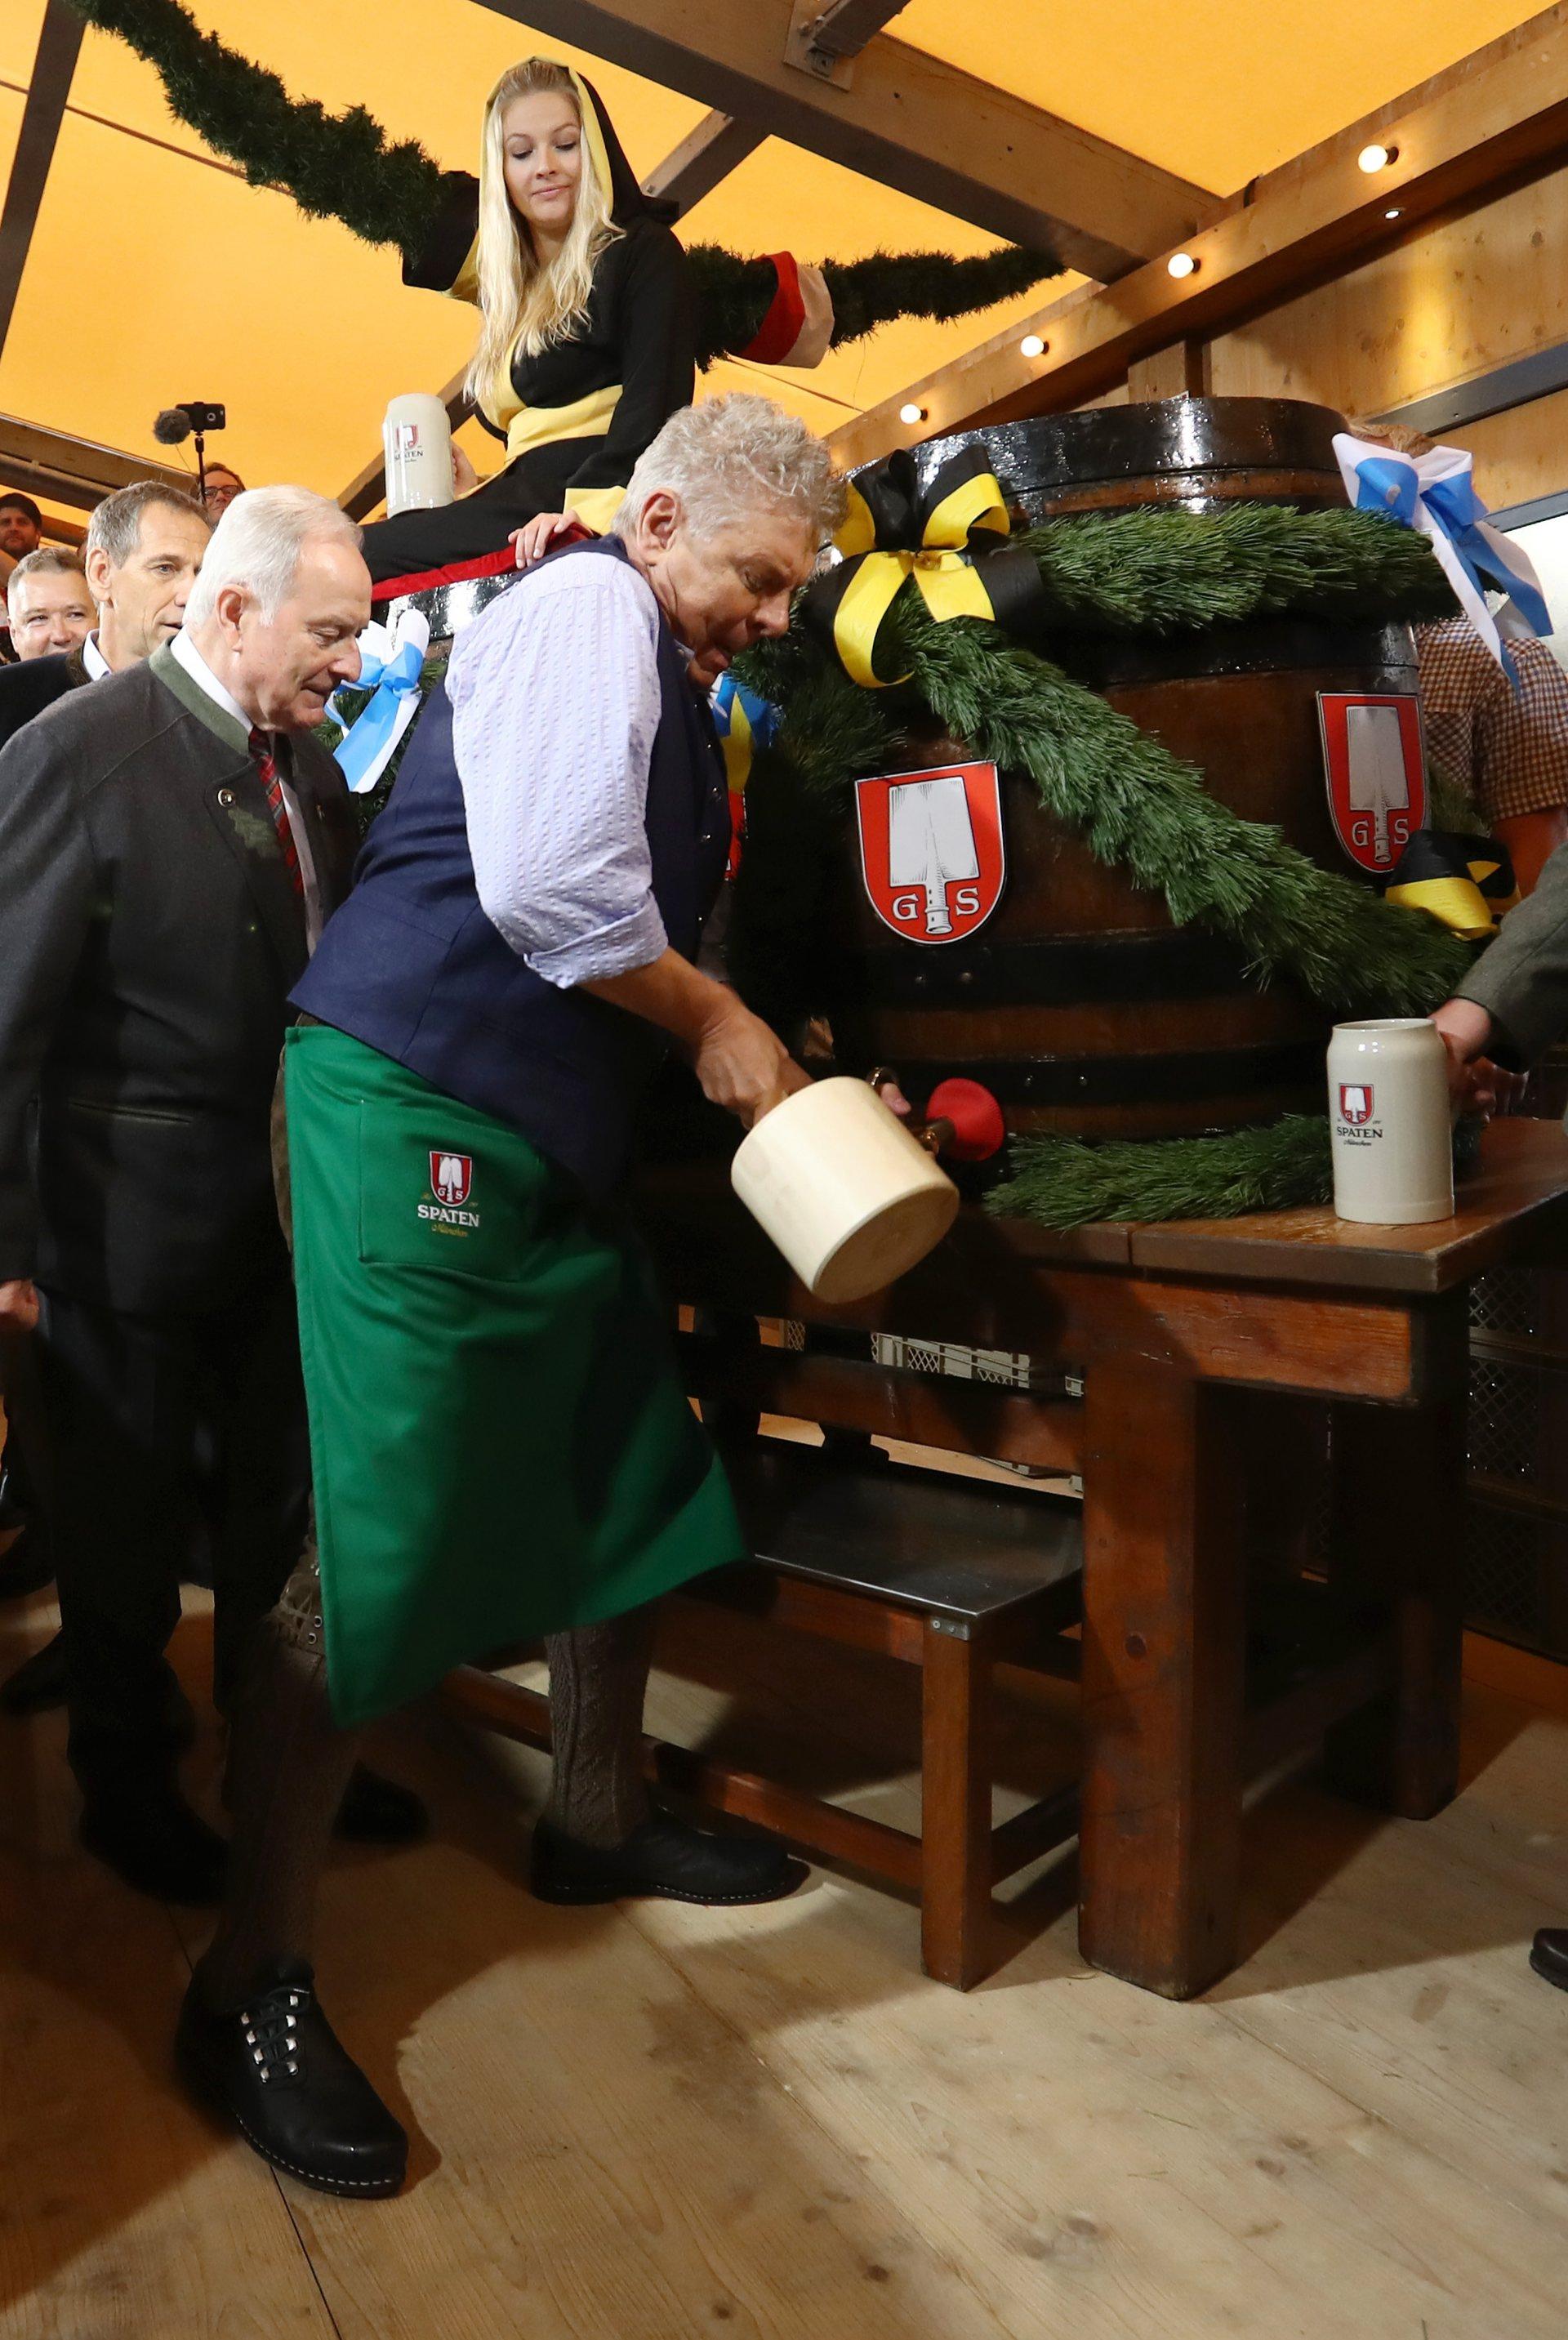 Обер-бургомистр Мюнхена Дитер Рёйтер открывает первый бочонок с пивом на «Октоберфесте». Фото: Alexander Hassenstein/Getty Images